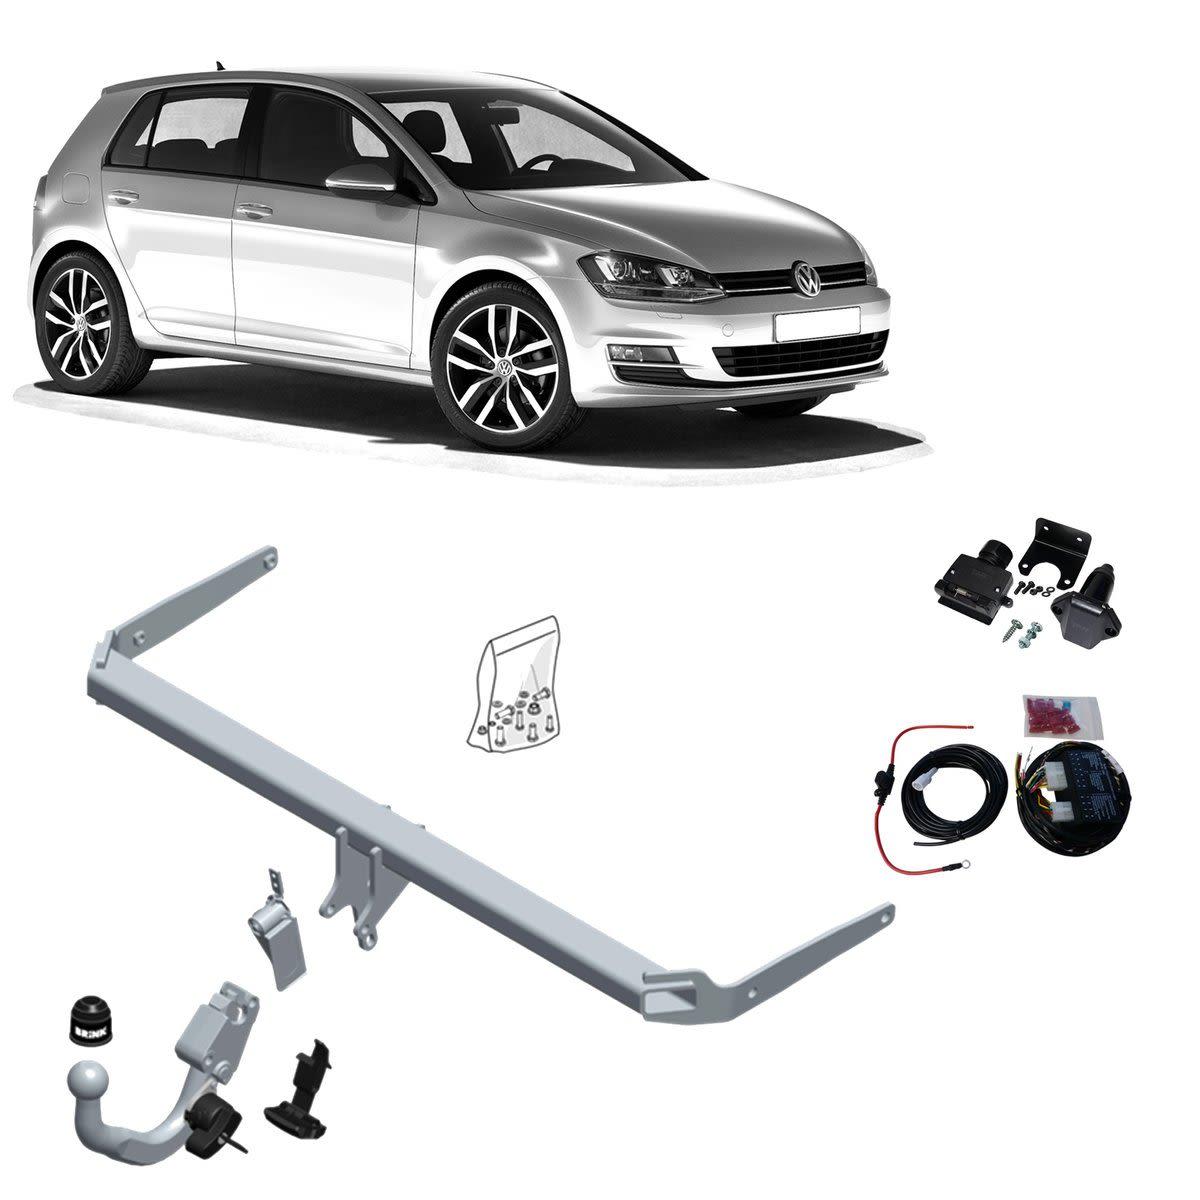 Brink Towbar to suit Volkswagen Golf (01/2012 - on)